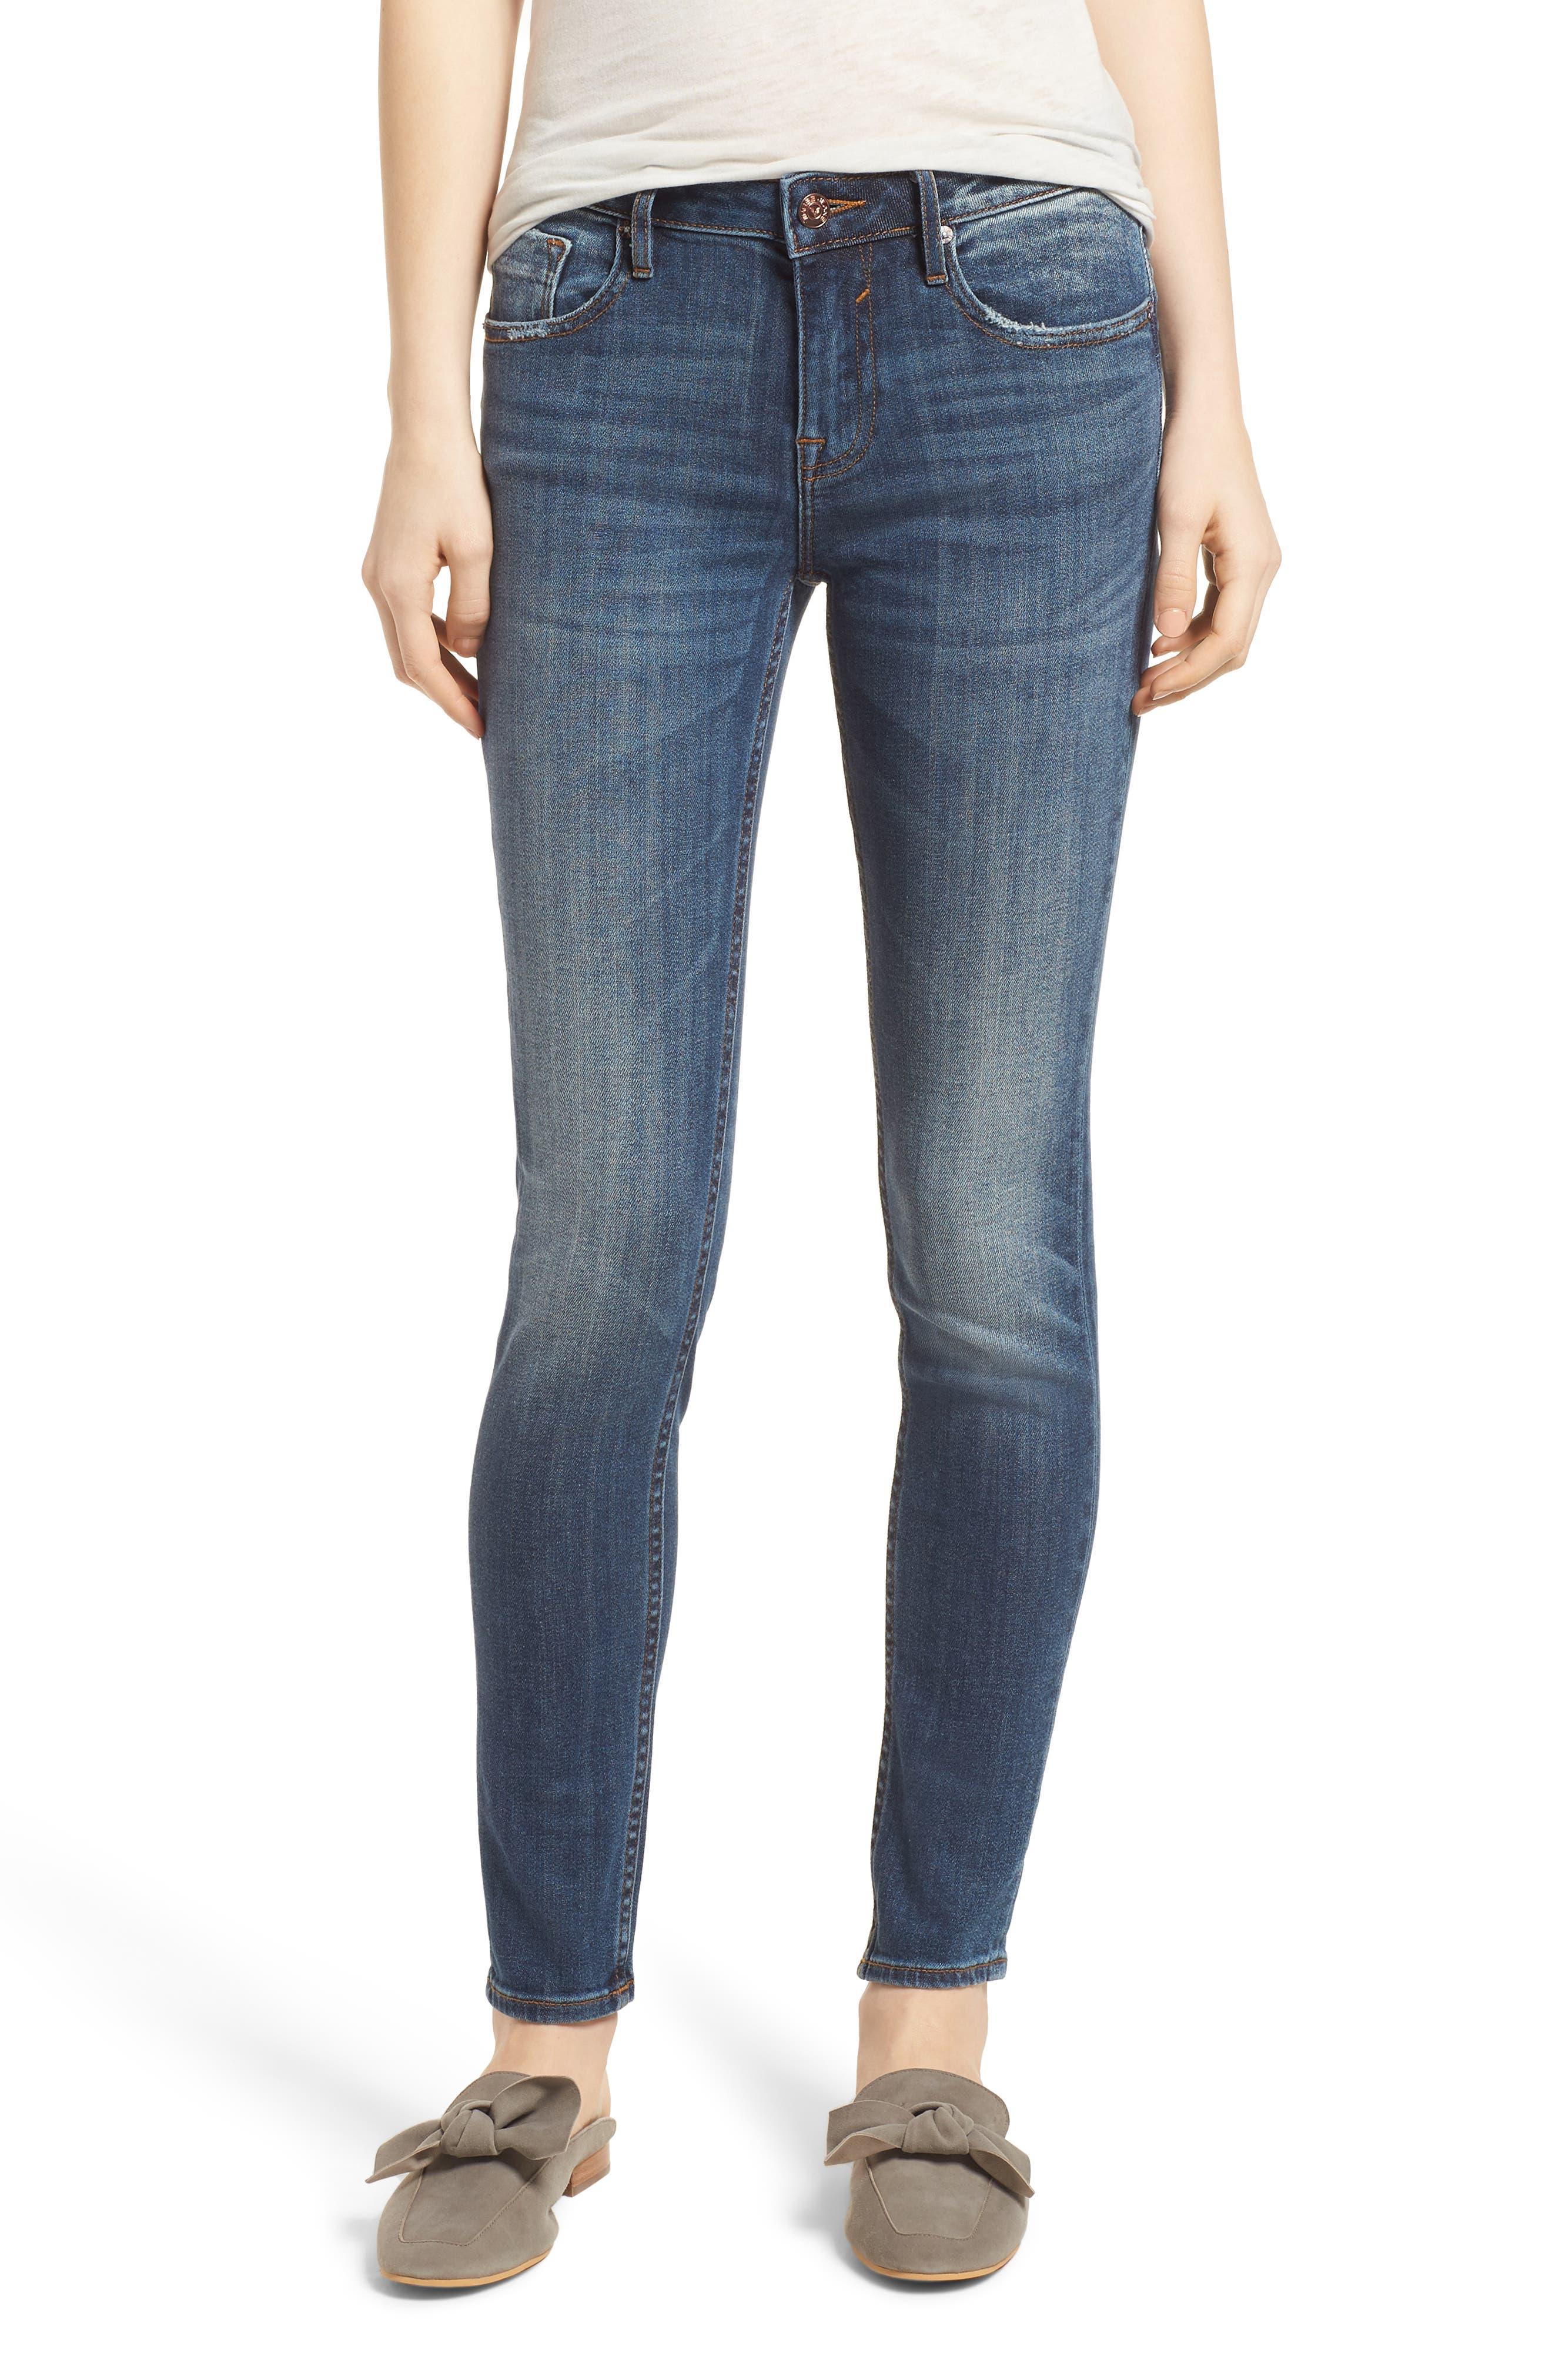 Jagger Skinny Jeans,                         Main,                         color, Medium Wash